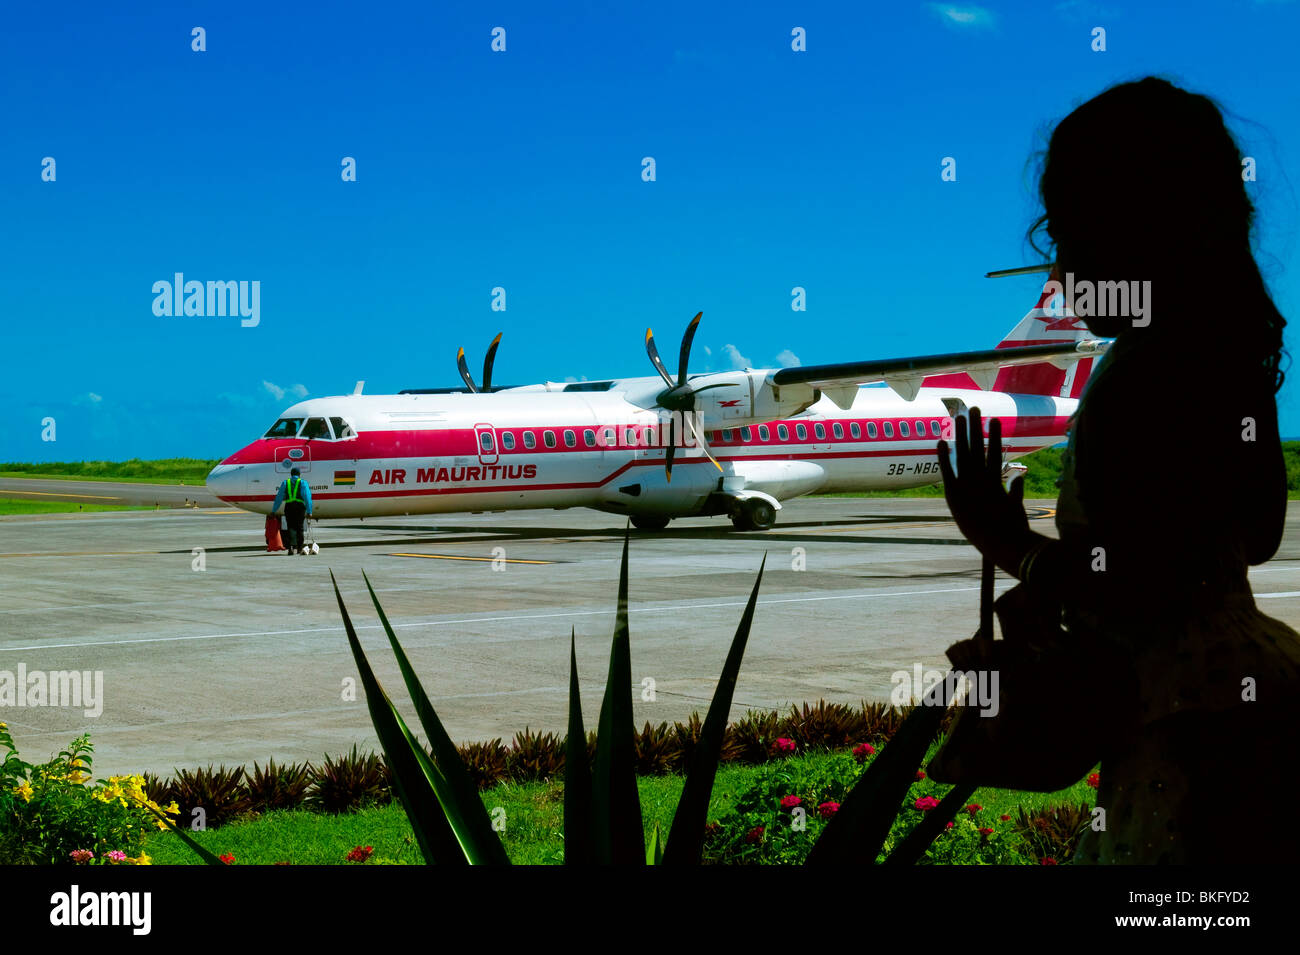 AIRPORT OF RODRIGUES ISLAND, MAURITIUS REPUBLIC Stock Photo